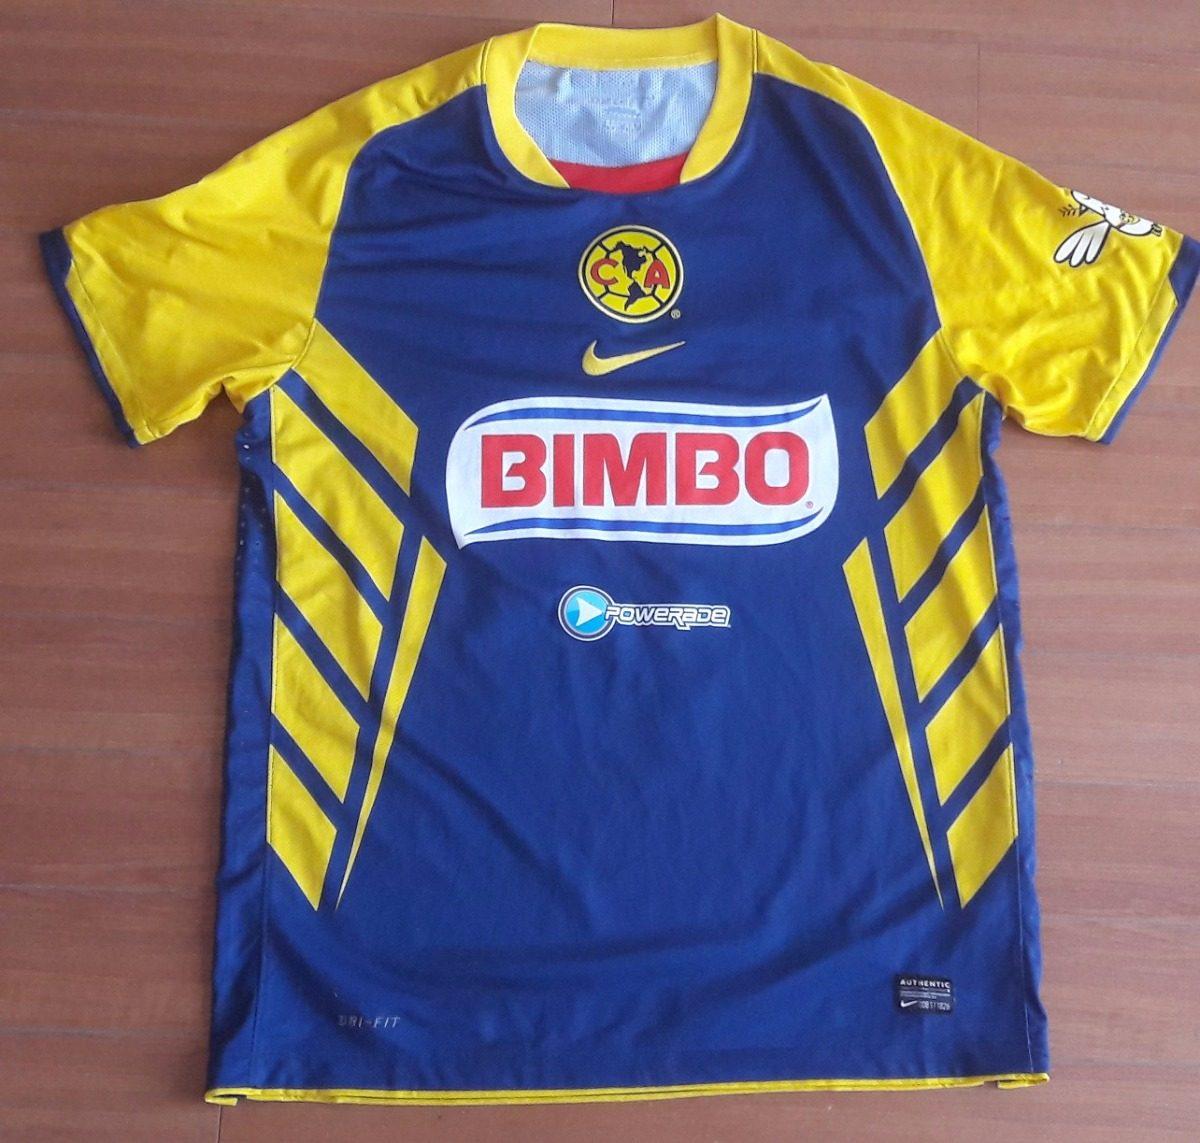 competitive price d8898 ee682 Jersey Club America 2010-2011 Vicente Sanchez Utileria Visit - $ 1,950.00